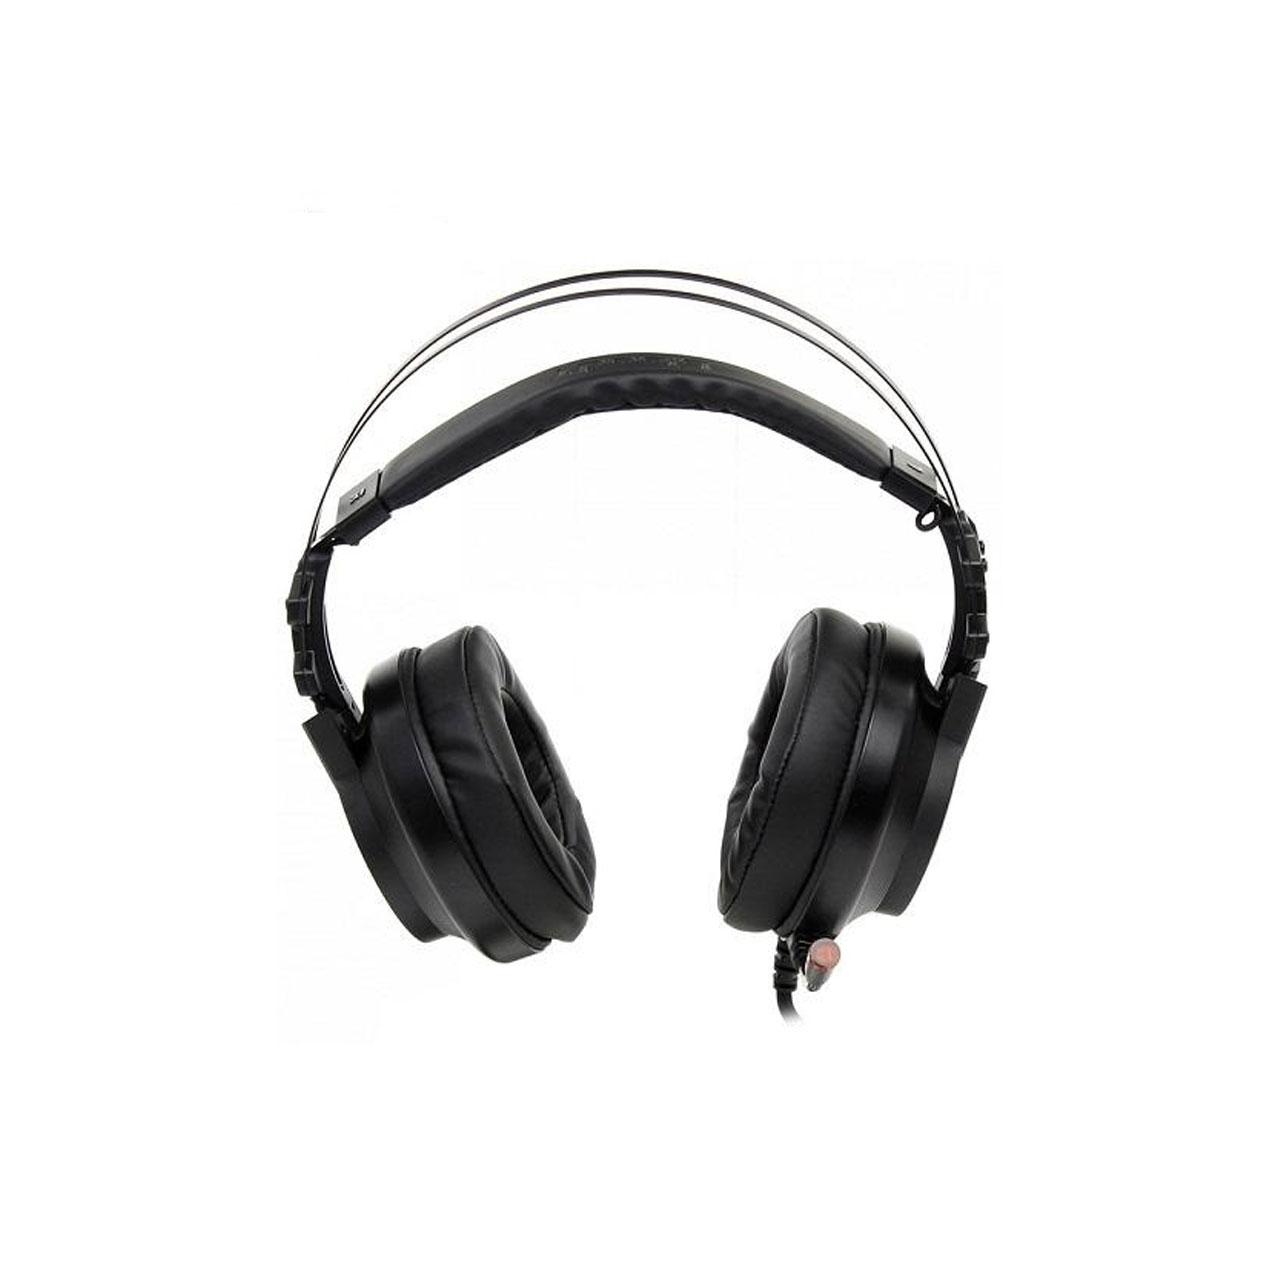 هدست33-ایفورتک-مدل-Headset-A4TECH-BLOODY-G528C